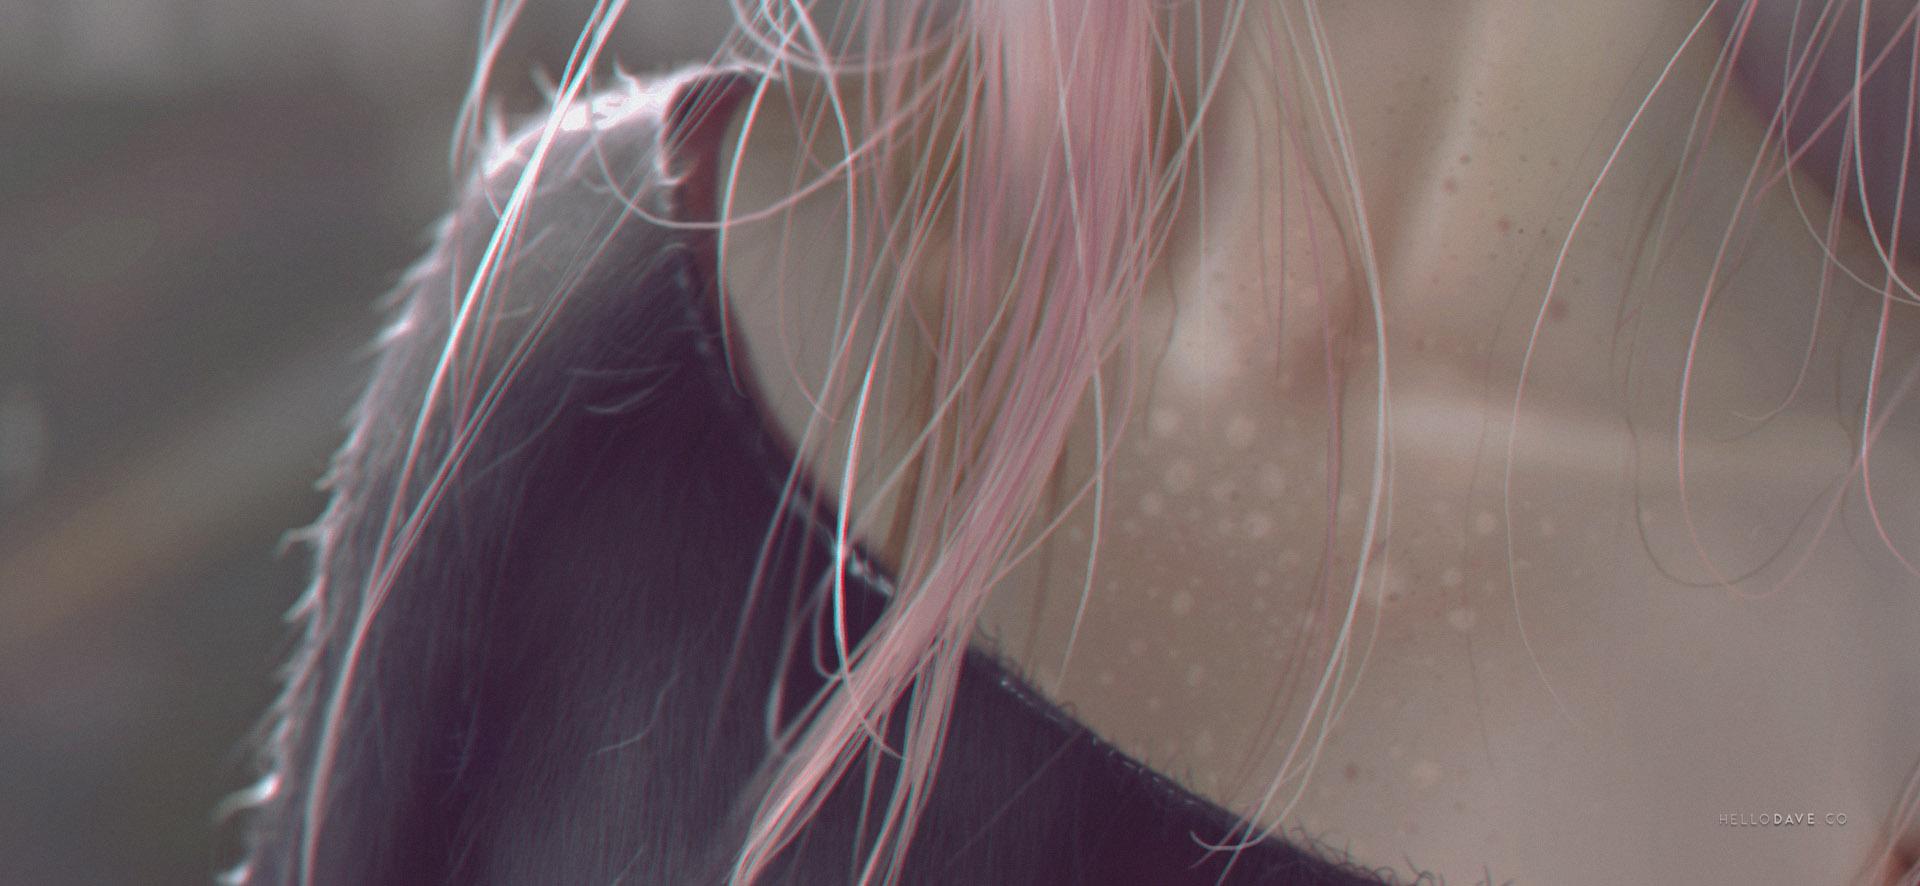 LovelyCreature_Closeup_03